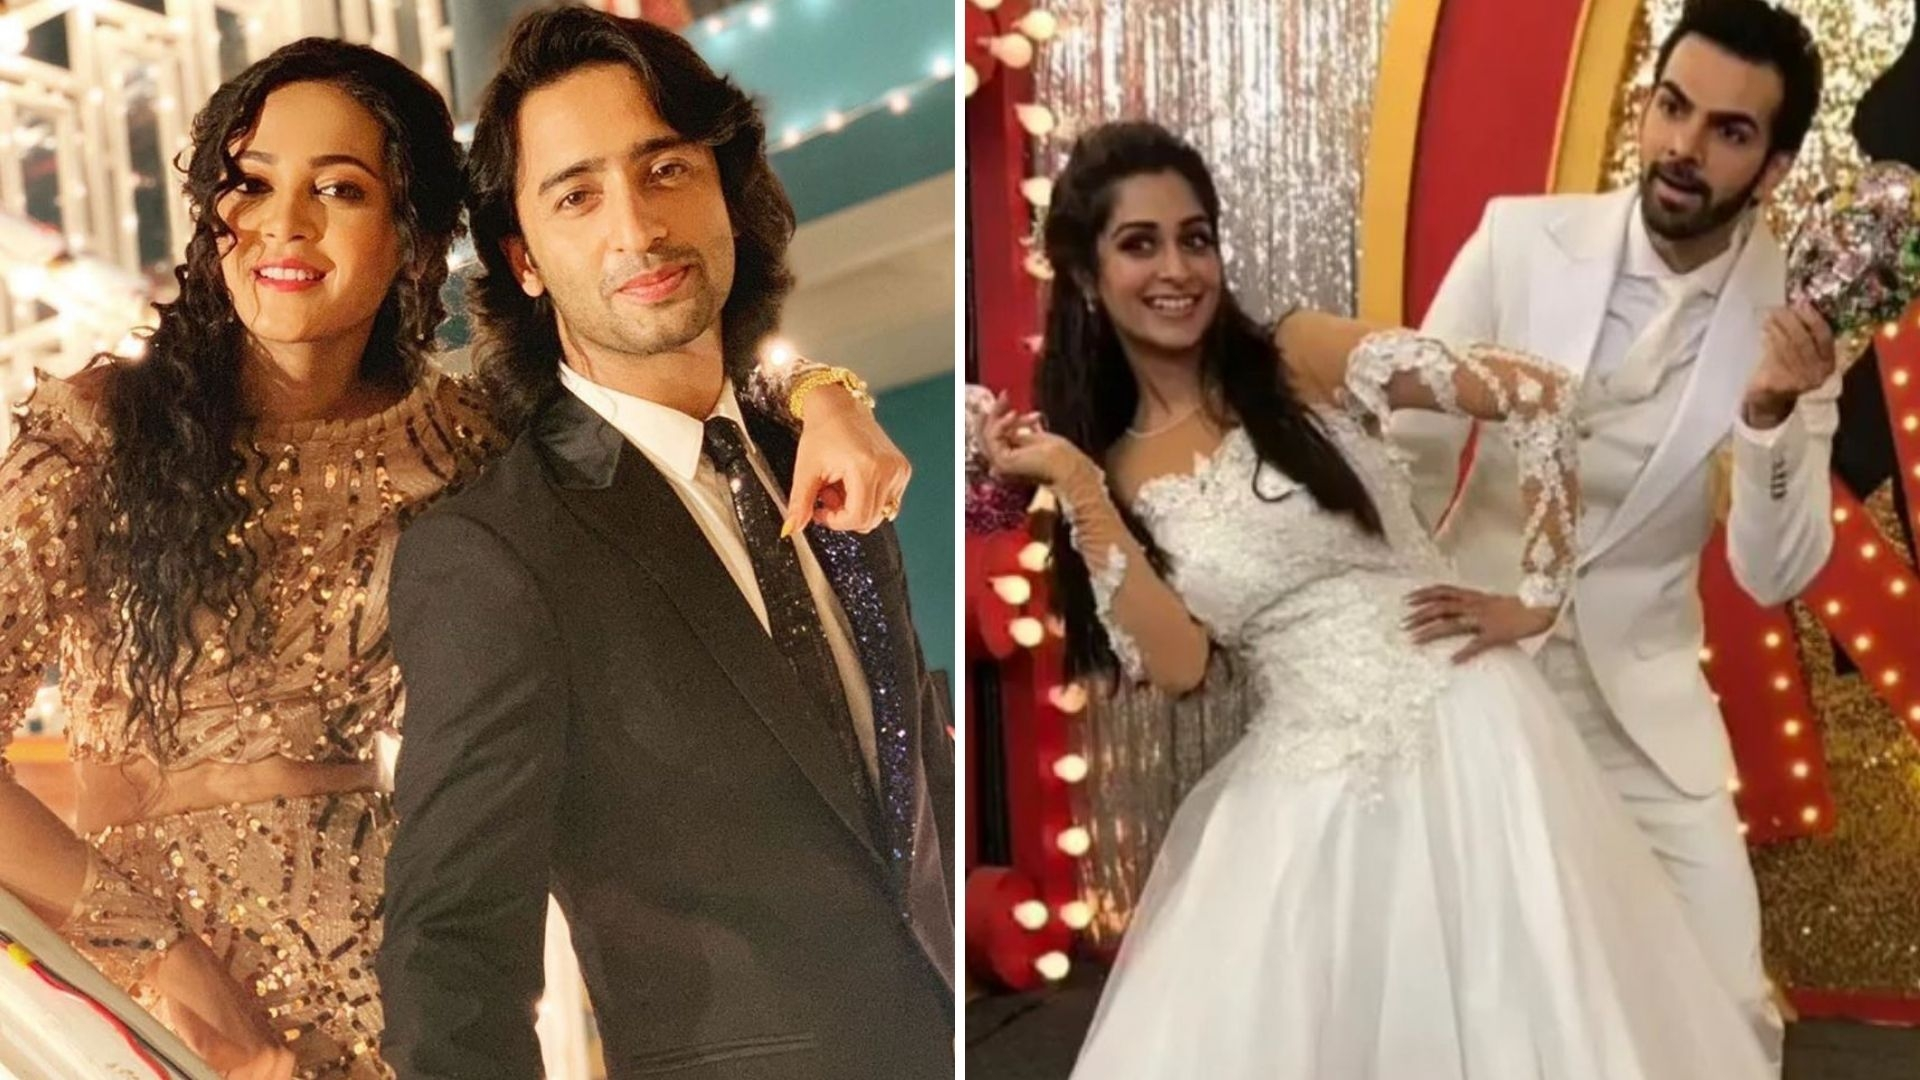 Salman and Popular TV Jodis to Light Up 'Nach Baliye 9' Premiere